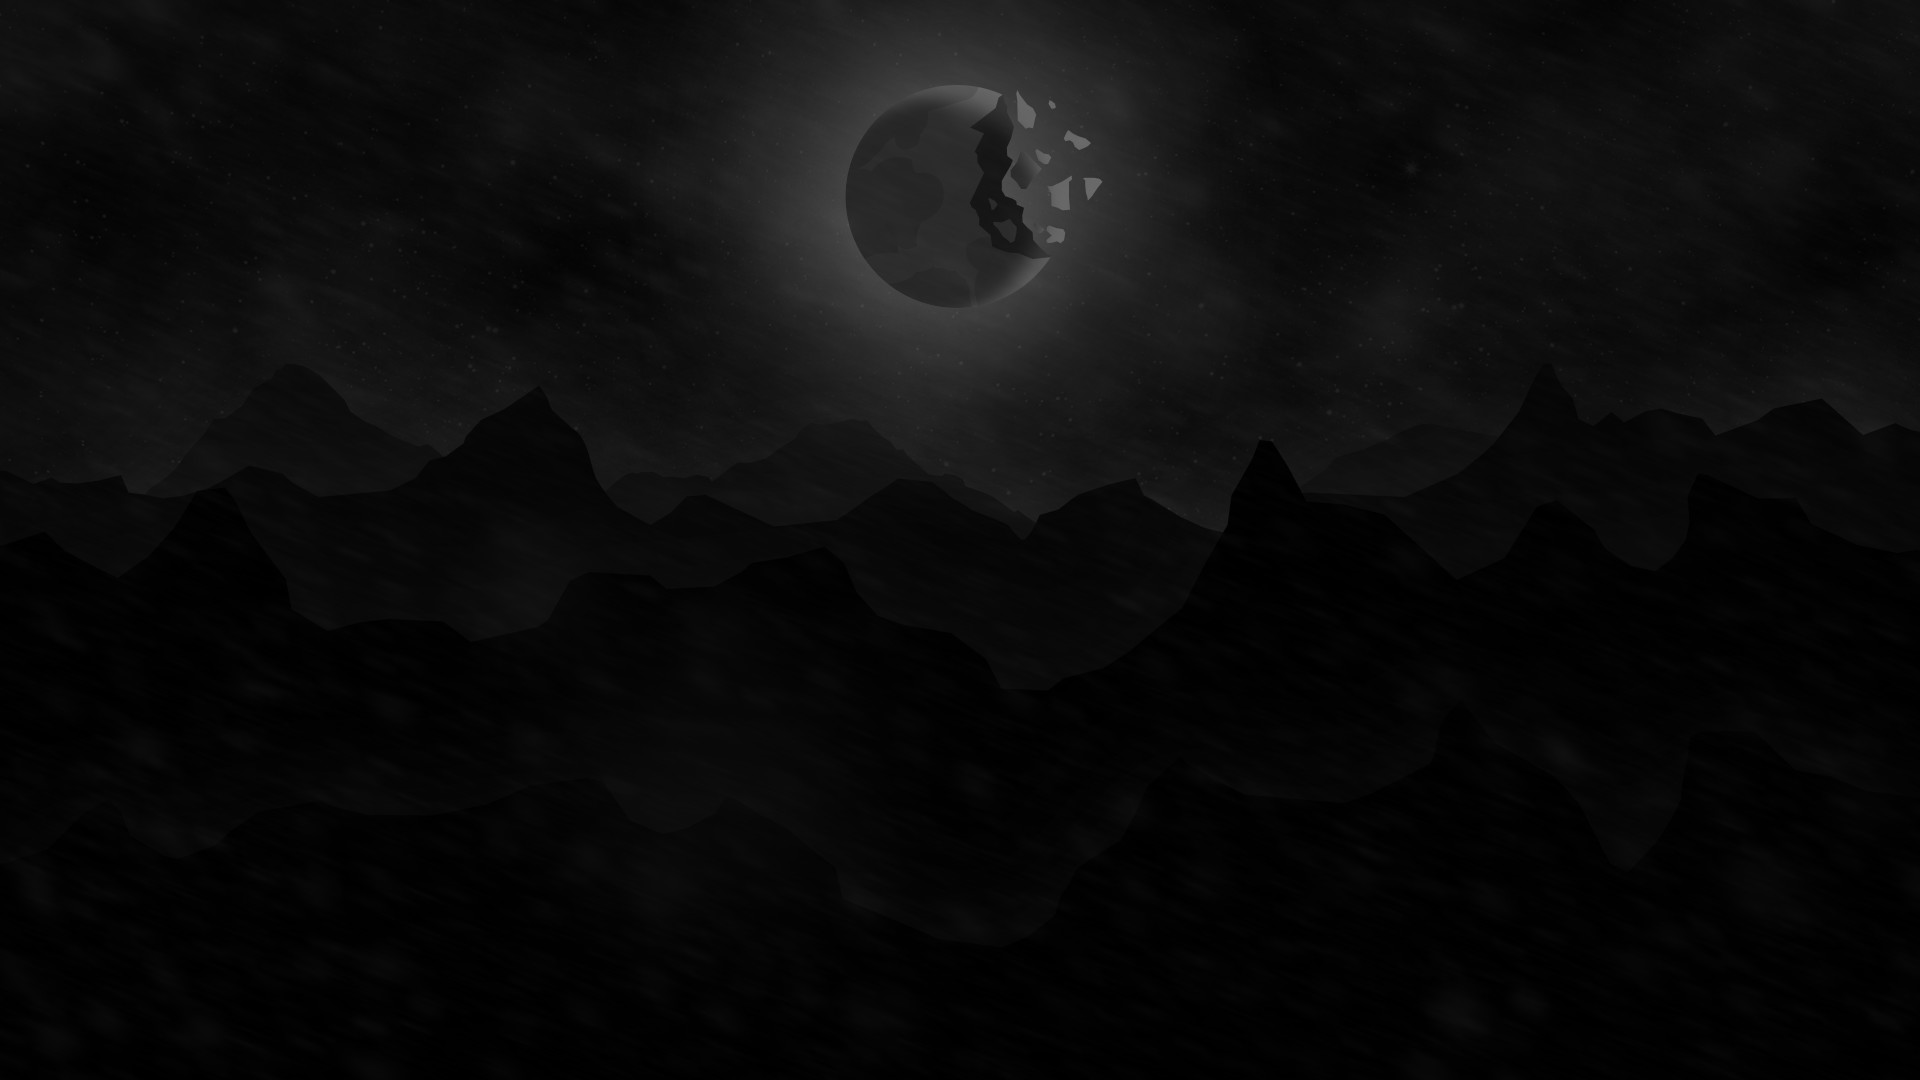 … RWBY: Dauntless Wallpaper by The-Xie